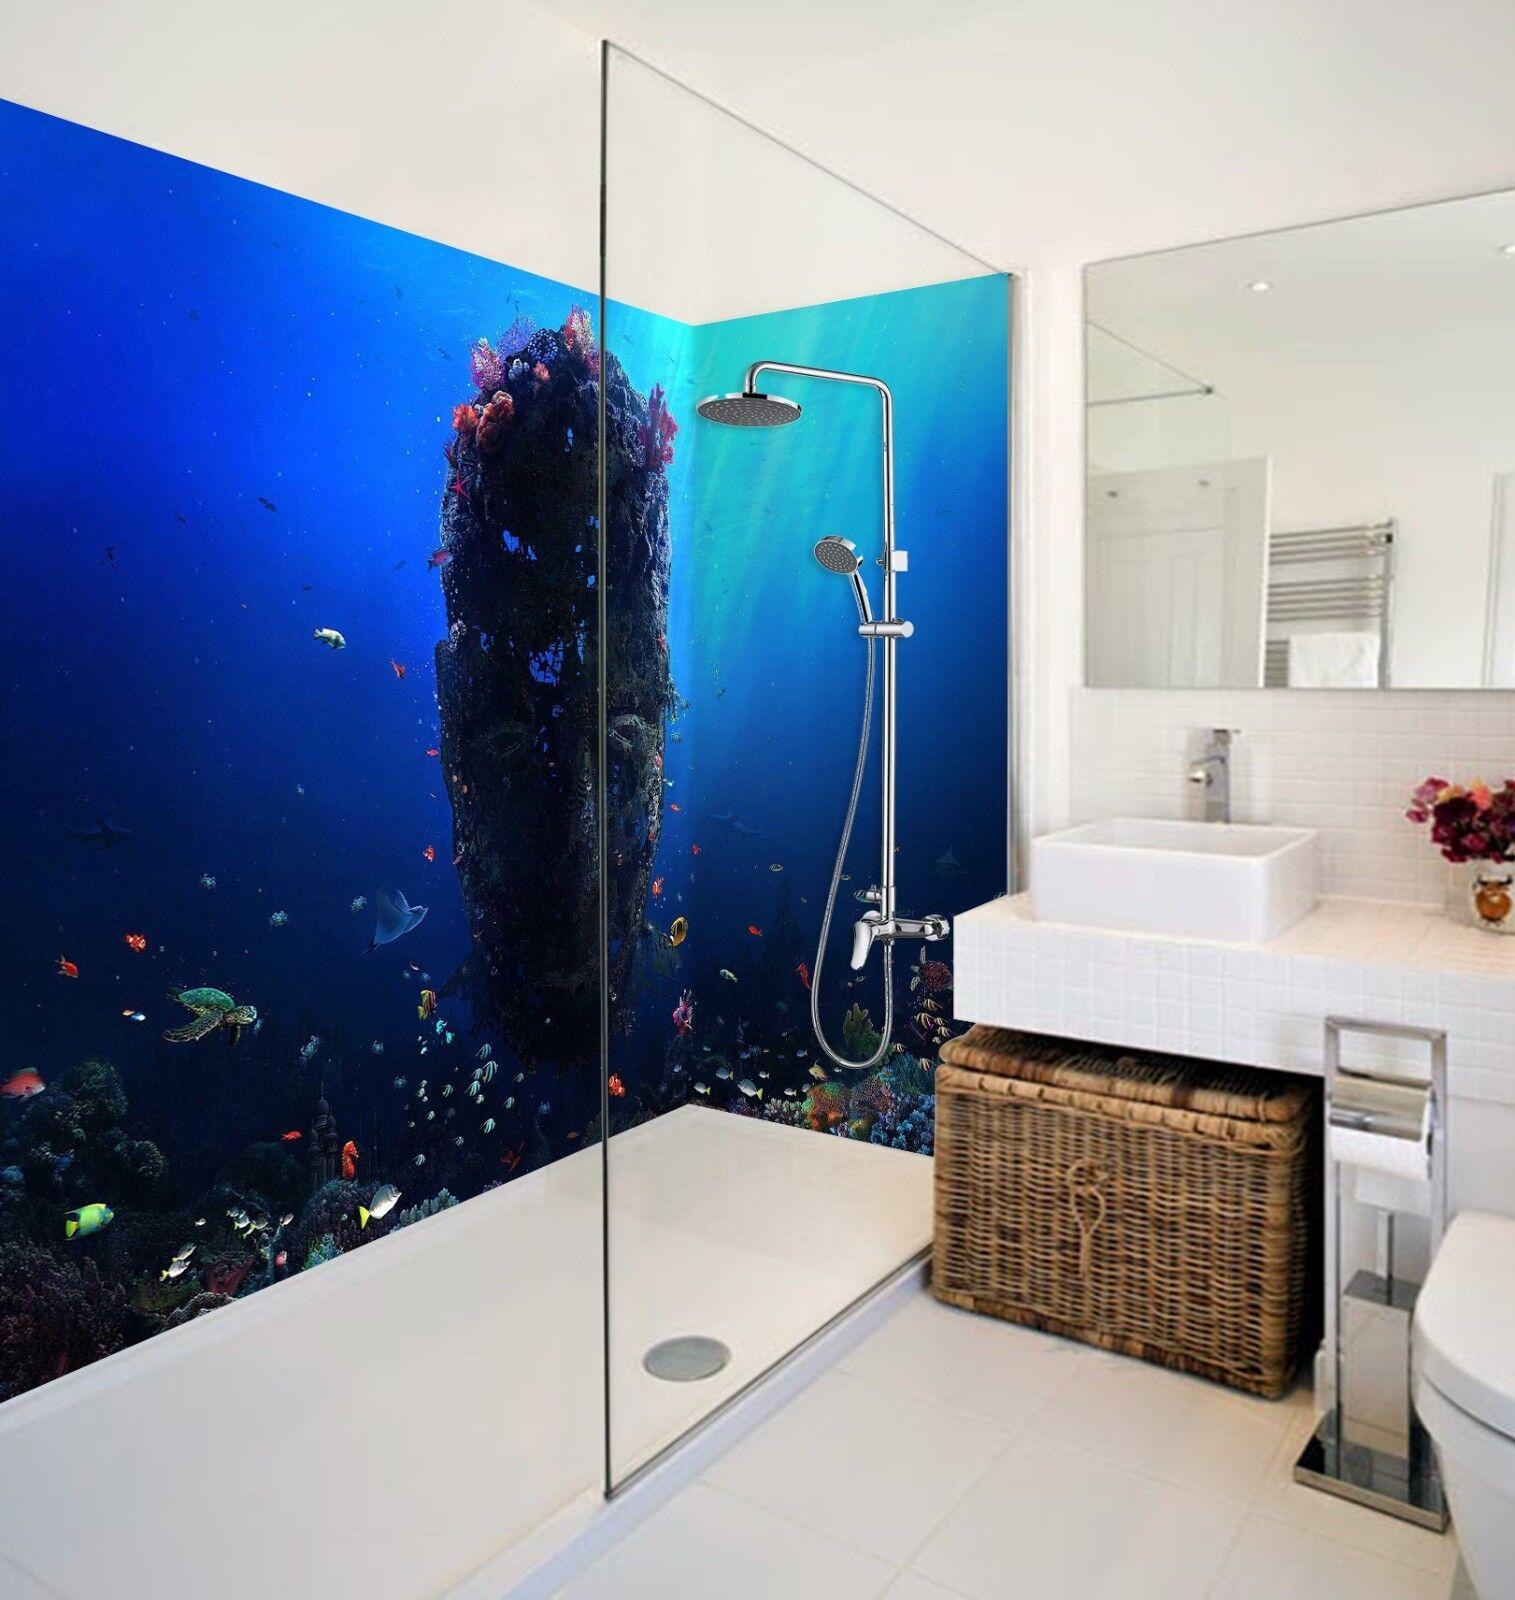 3D Ocean Scenery 4227 WallPaper Bathroom Print Decal Wall Deco AJ WALLPAPER AU